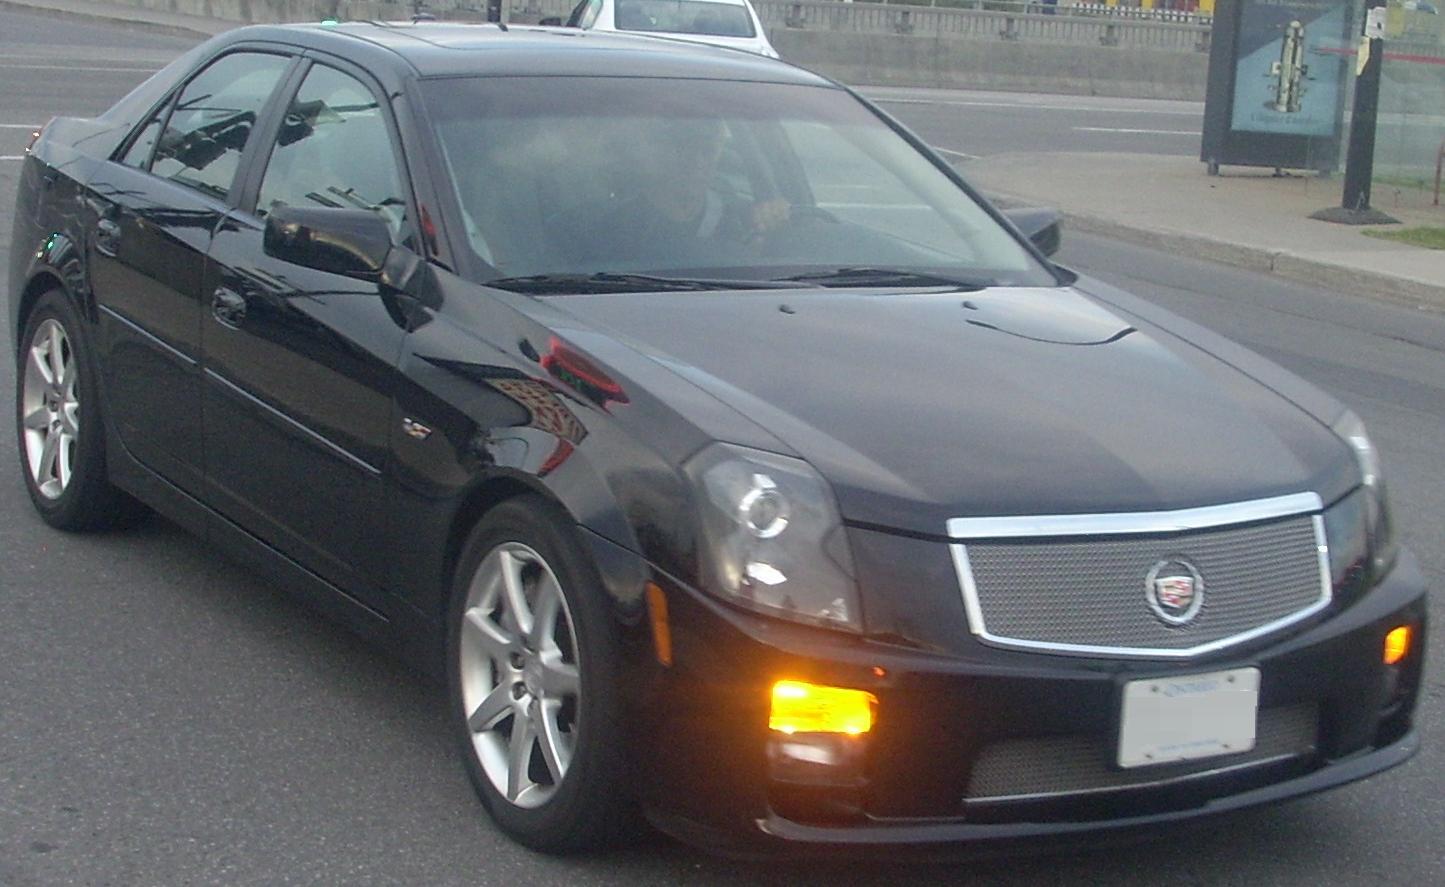 2004 Cadillac CTS Base - Sedan 3.2L V6 Manual